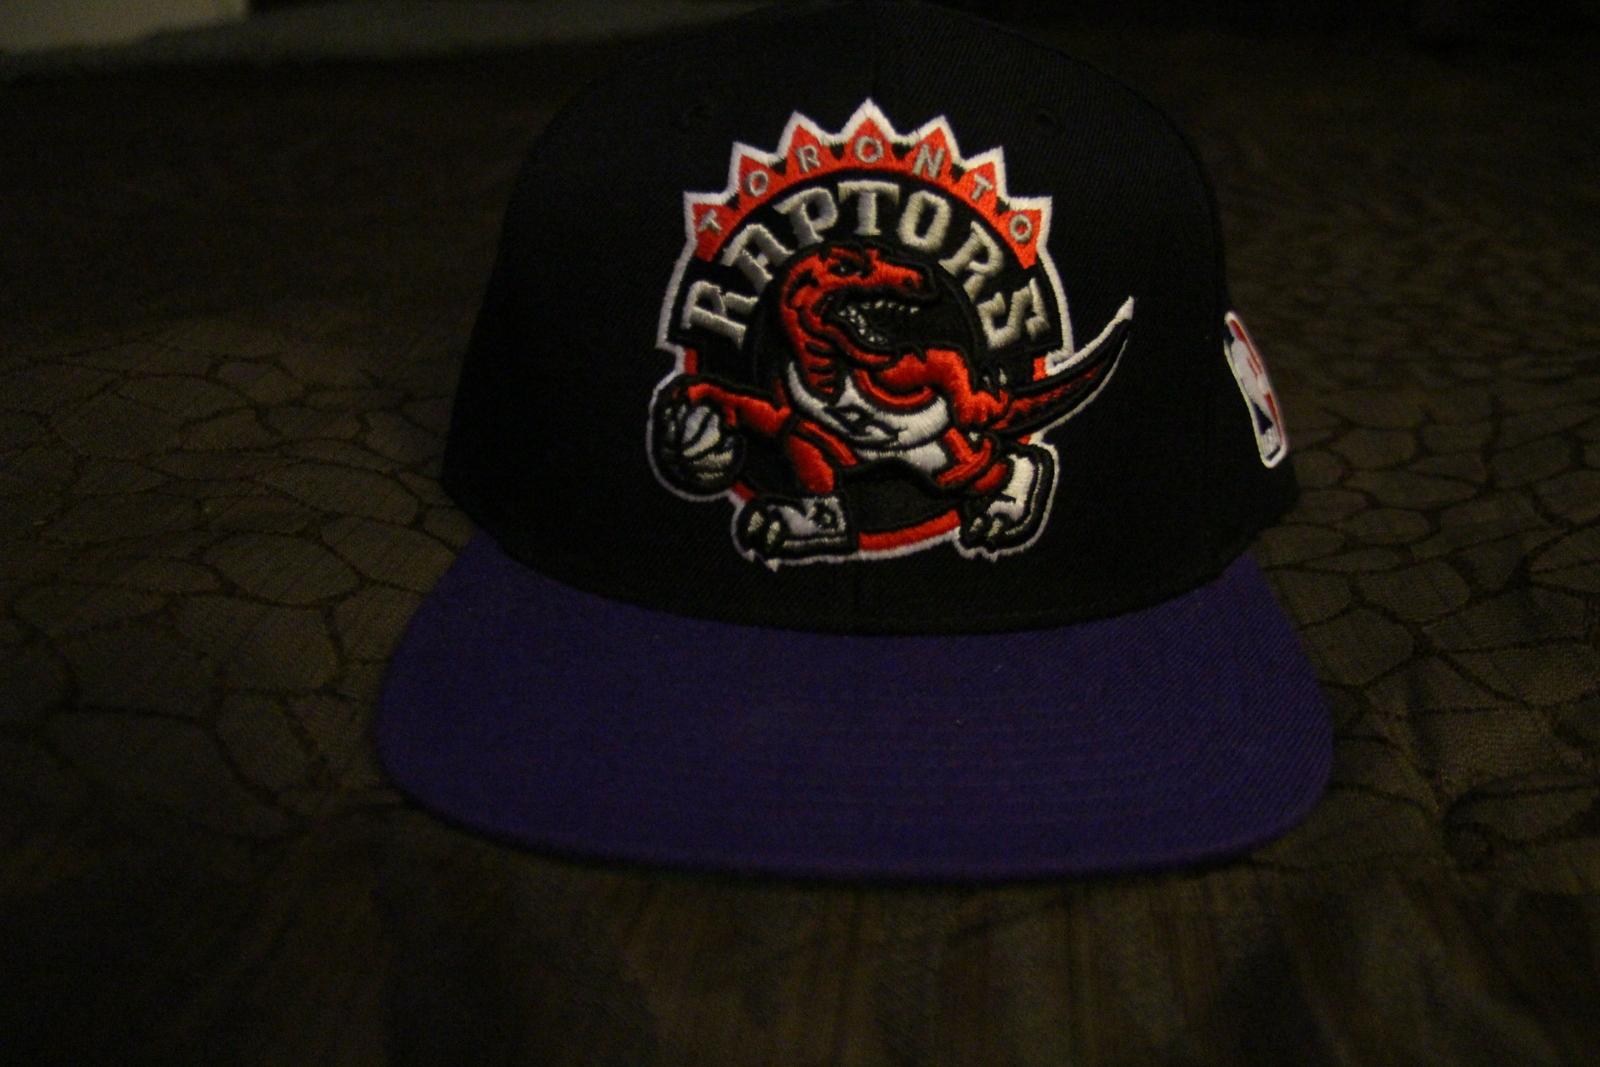 buy online 2f8bd f63fc Img 5585. Img 5585. Previous. Mitchell   Ness - Hardwood Classic - Snapback  Hat - Toronto Raptors · Mitchell ...